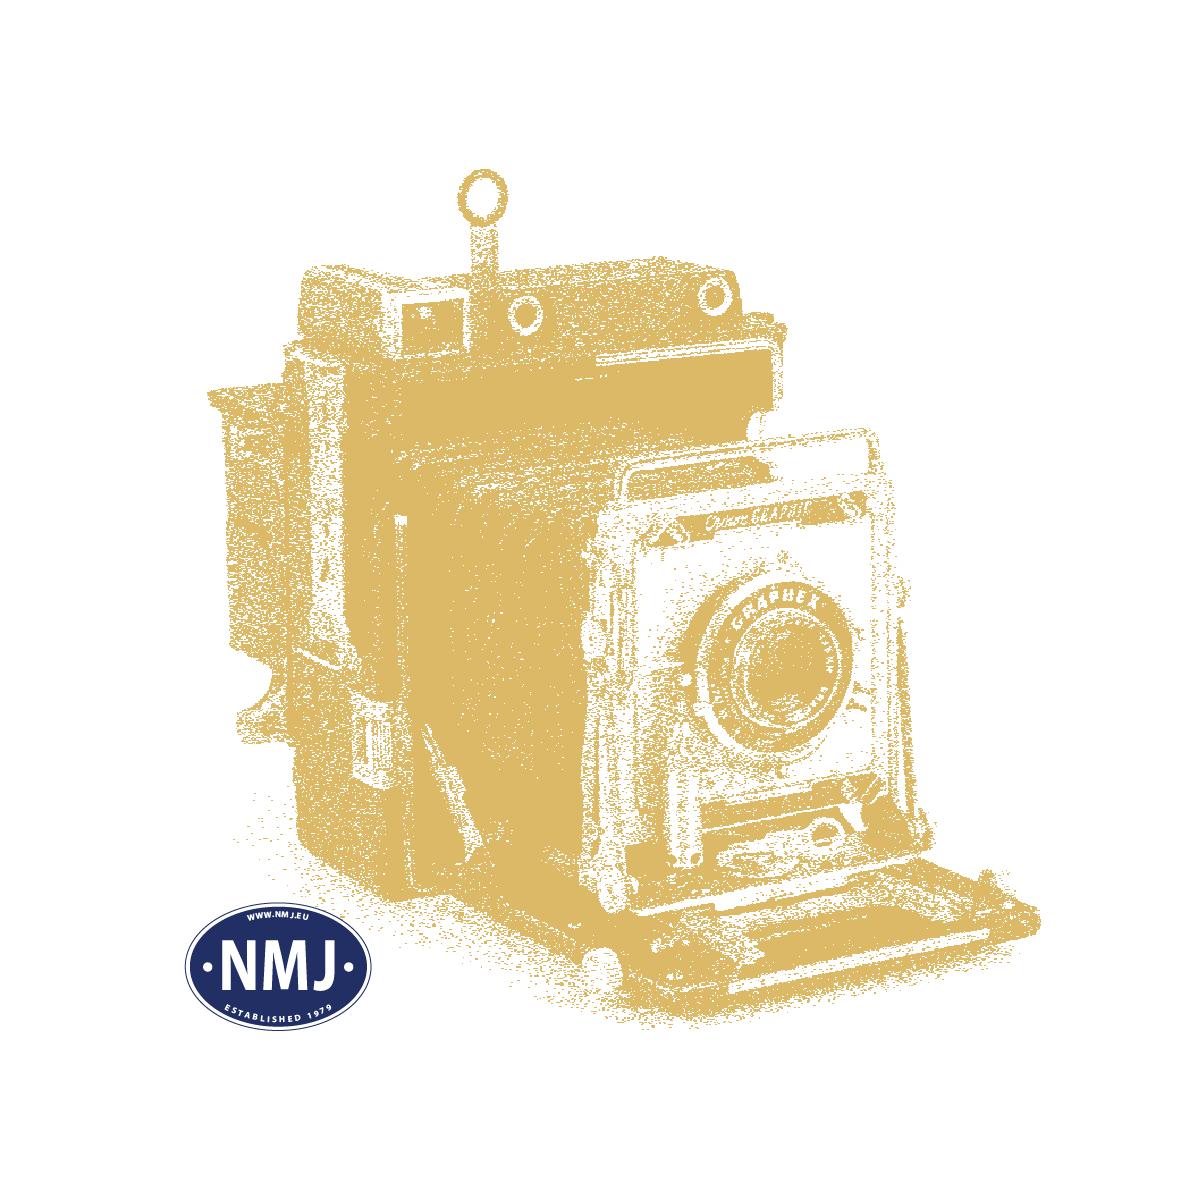 NMJT80.202AC - NMJ Topline NSB EL17.2229, AC